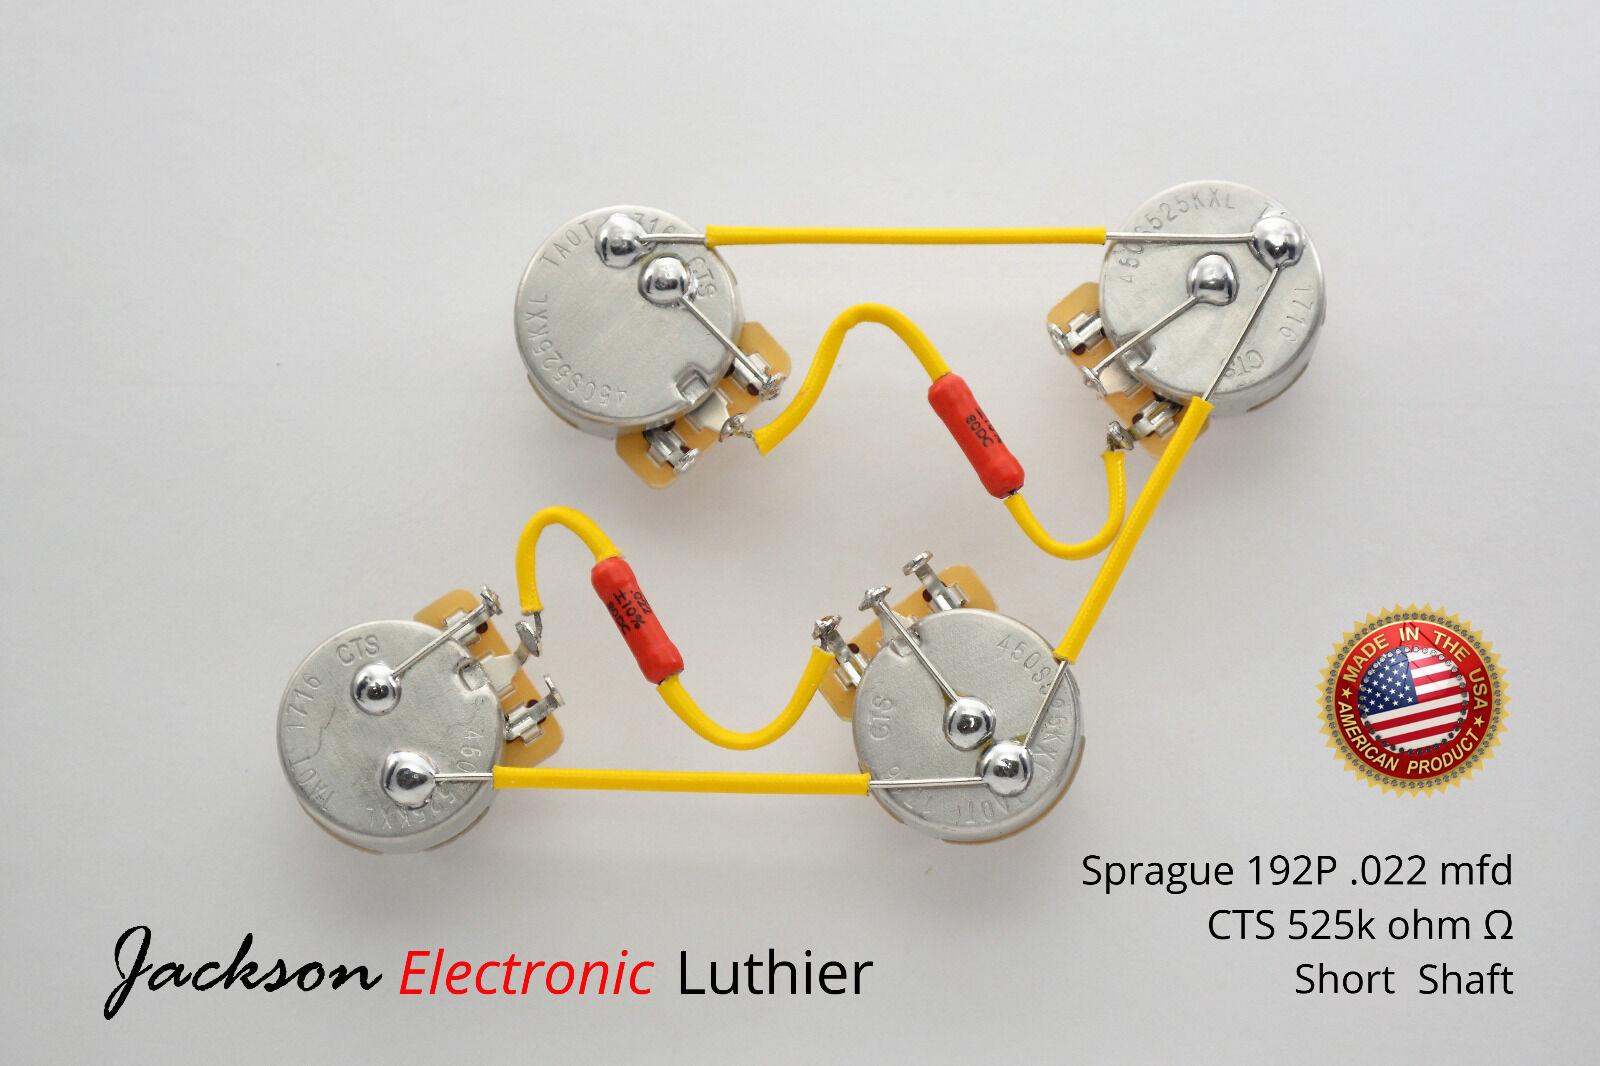 Les Paul Wiring Harness Kit 525k Short .022 uF Sprague 192P Orange DROP Caps